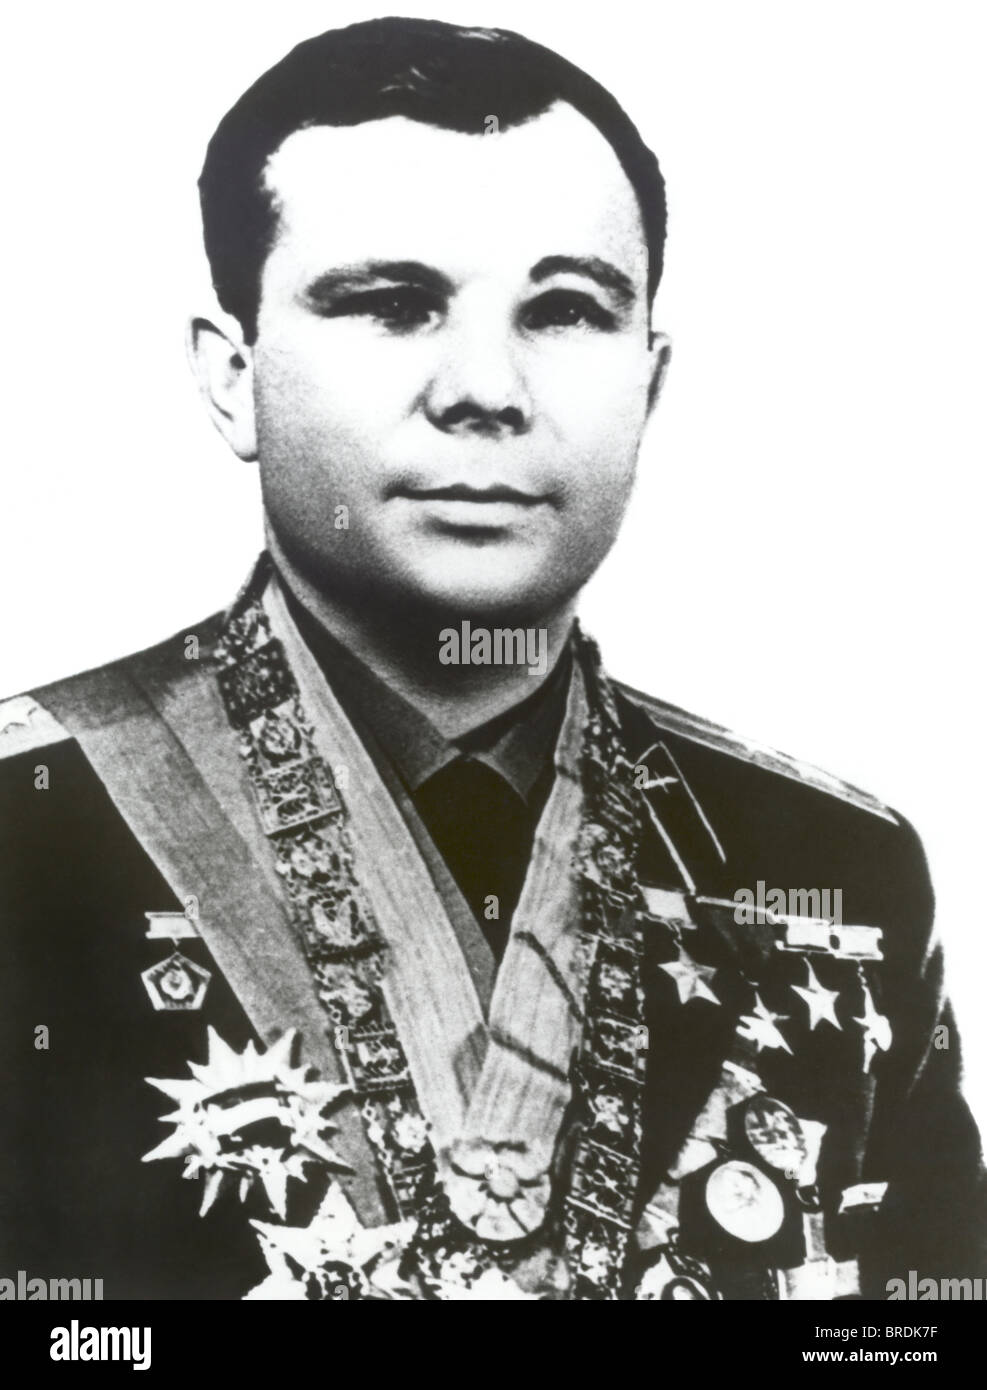 Yuri Gagarin, Yuri Alekseyevich Gagarin, Soviet cosmonaut and first human in space. - Stock Image